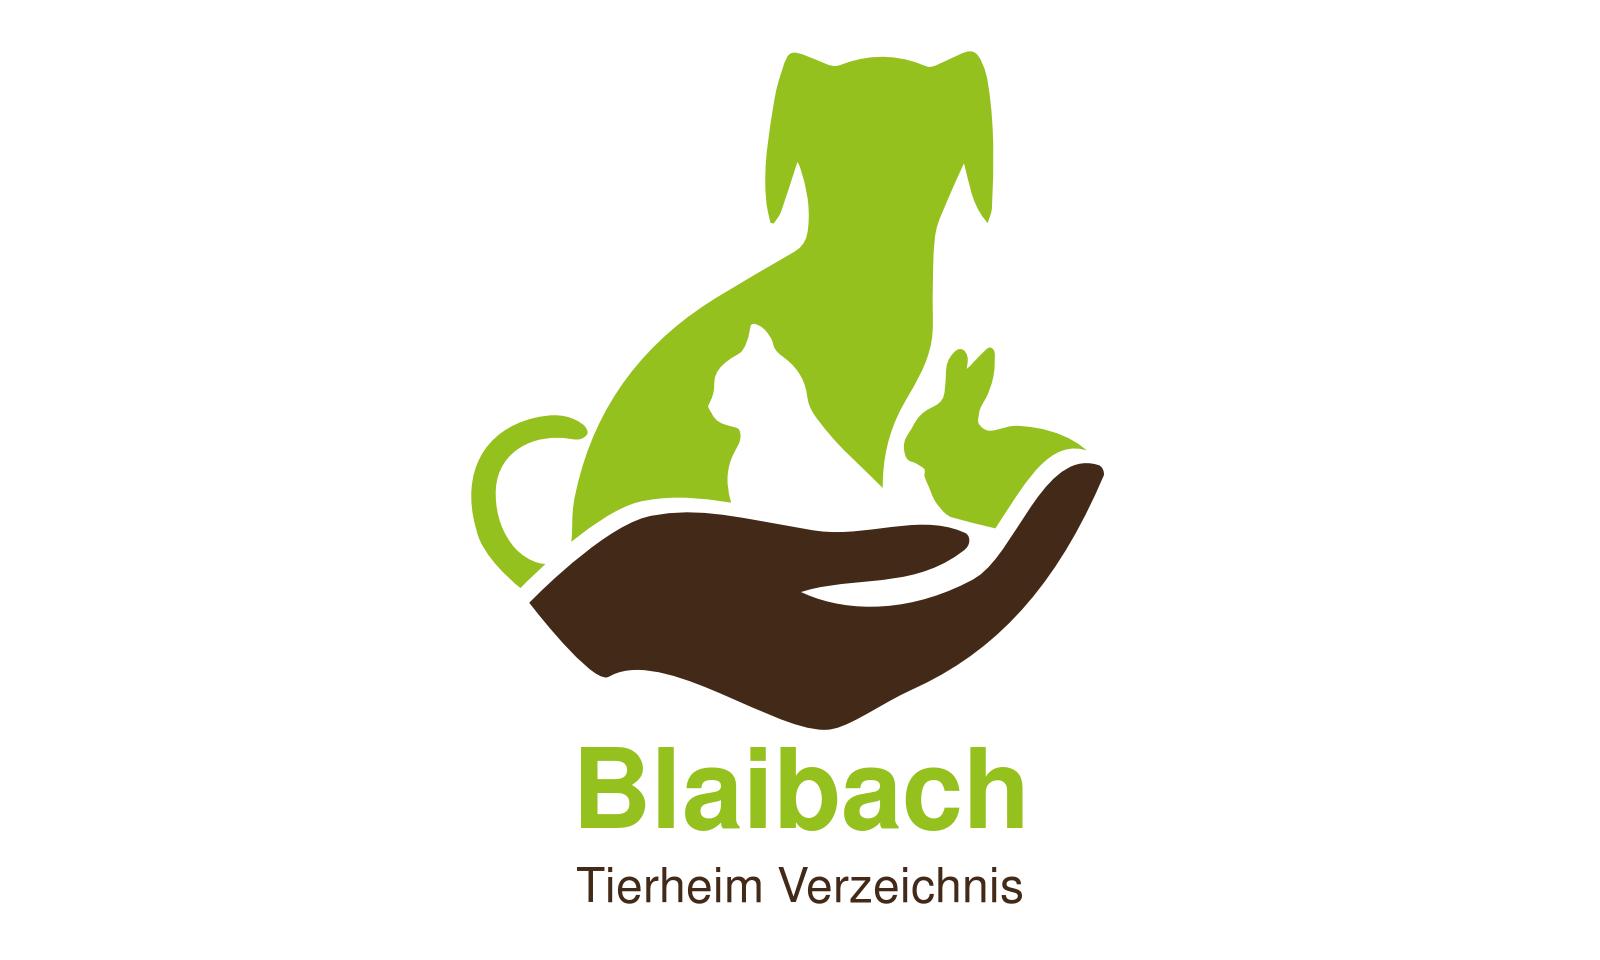 Tierheim Blaibach